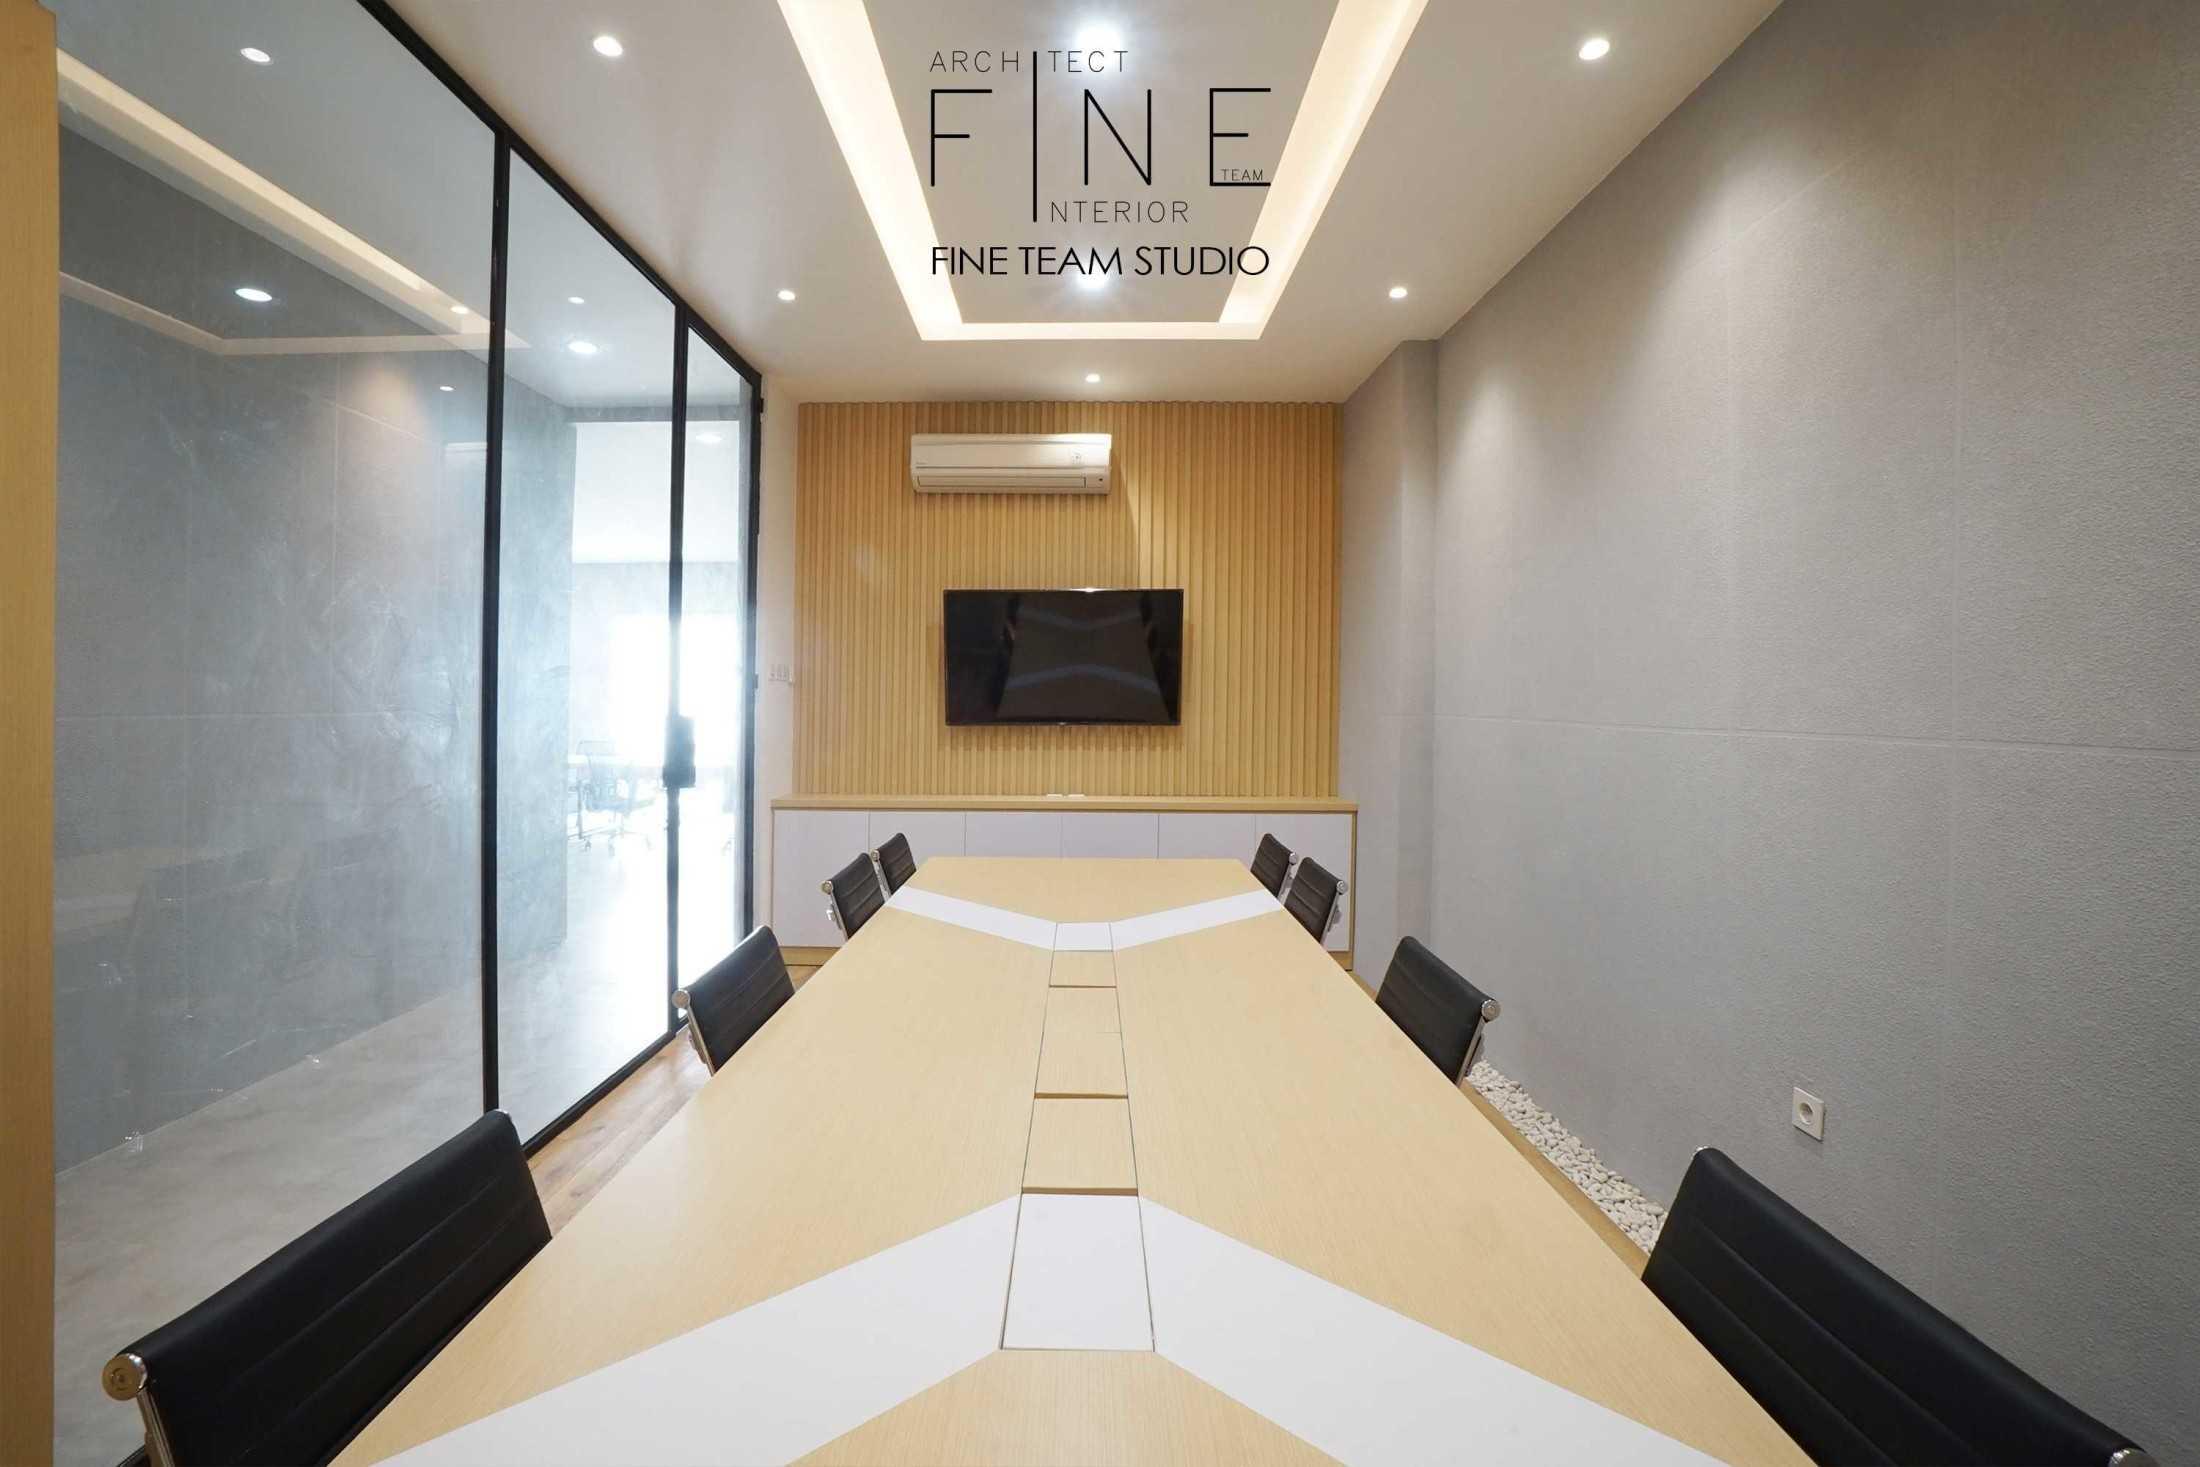 Fine Team Studio Mob Office Cikupa, Tangerang, Banten, Indonesia Cikupa, Tangerang, Banten, Indonesia Fine-Team-Studio-Mob-Office  71151